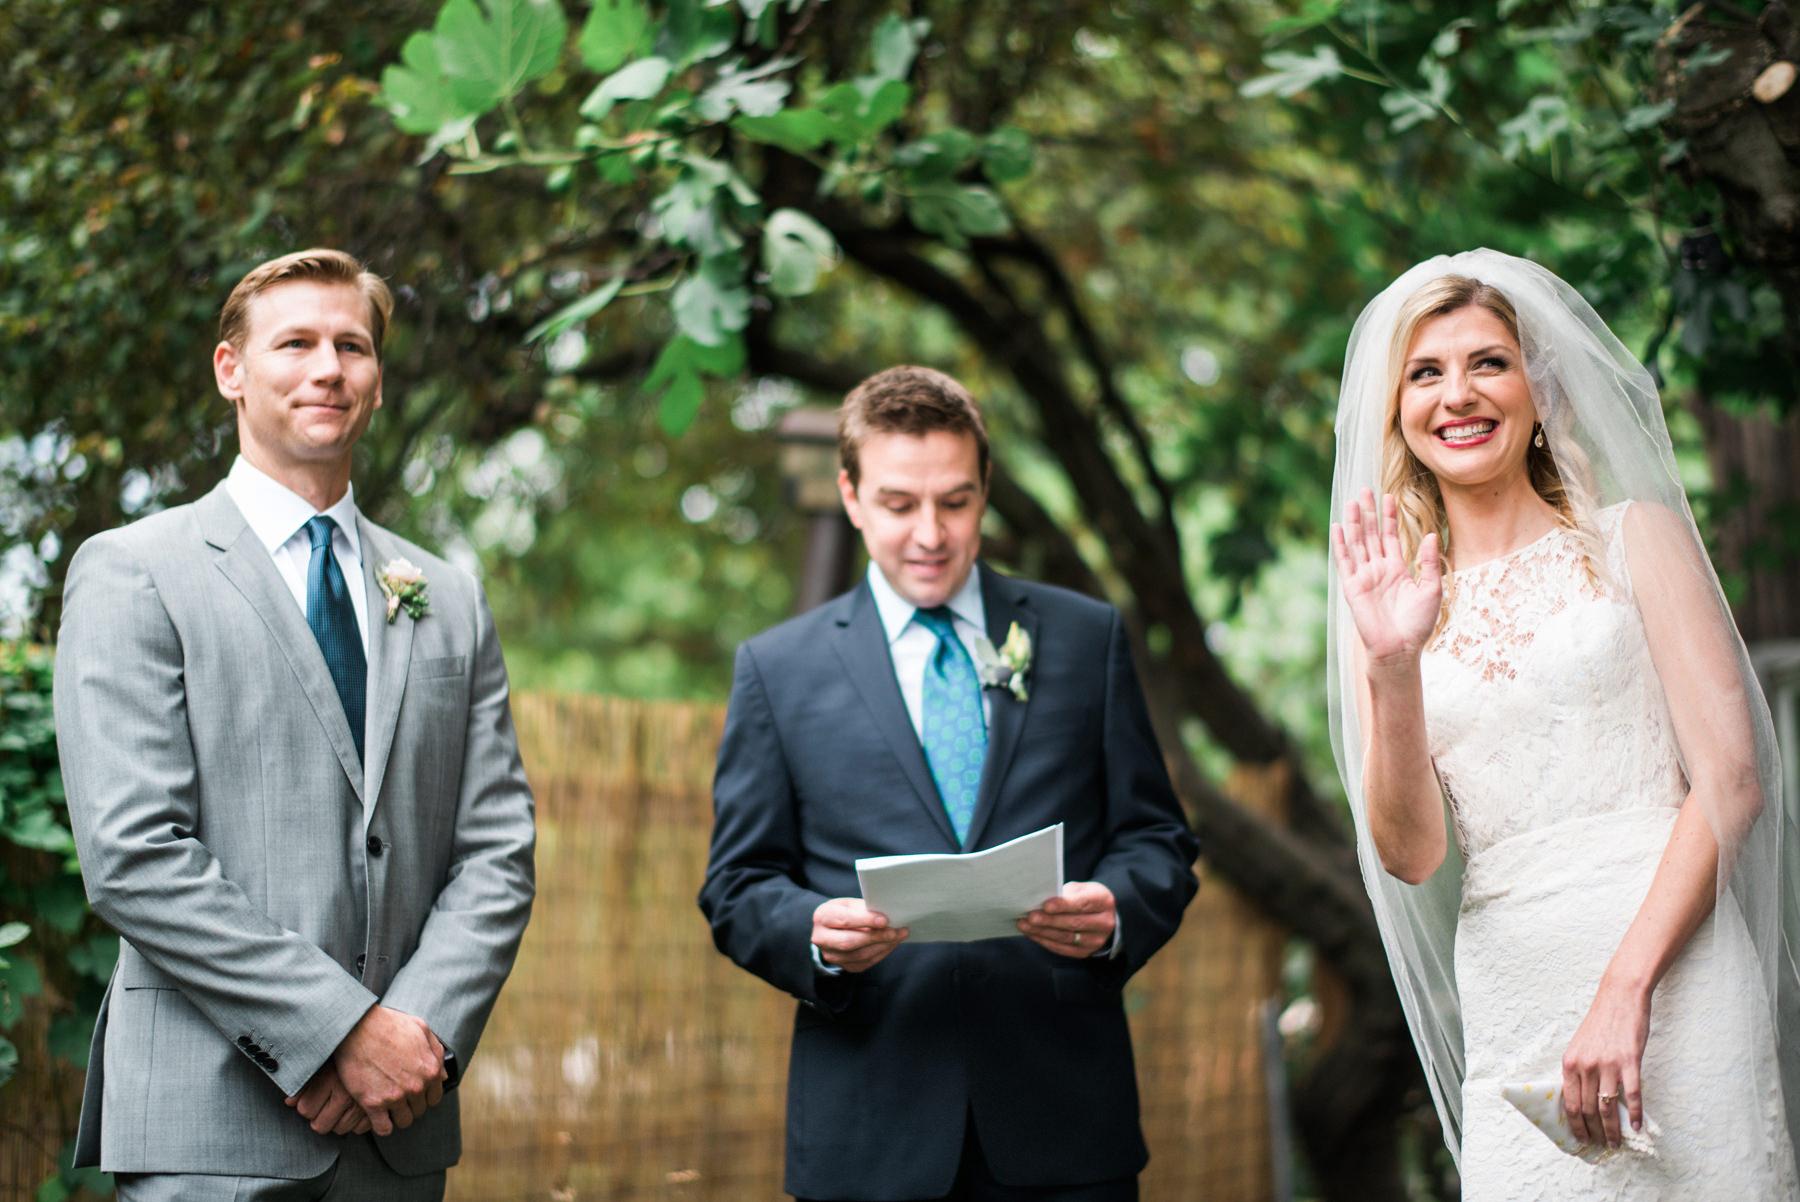 207-outdoor-wedding-ceremony-at-the-corson-building.jpg